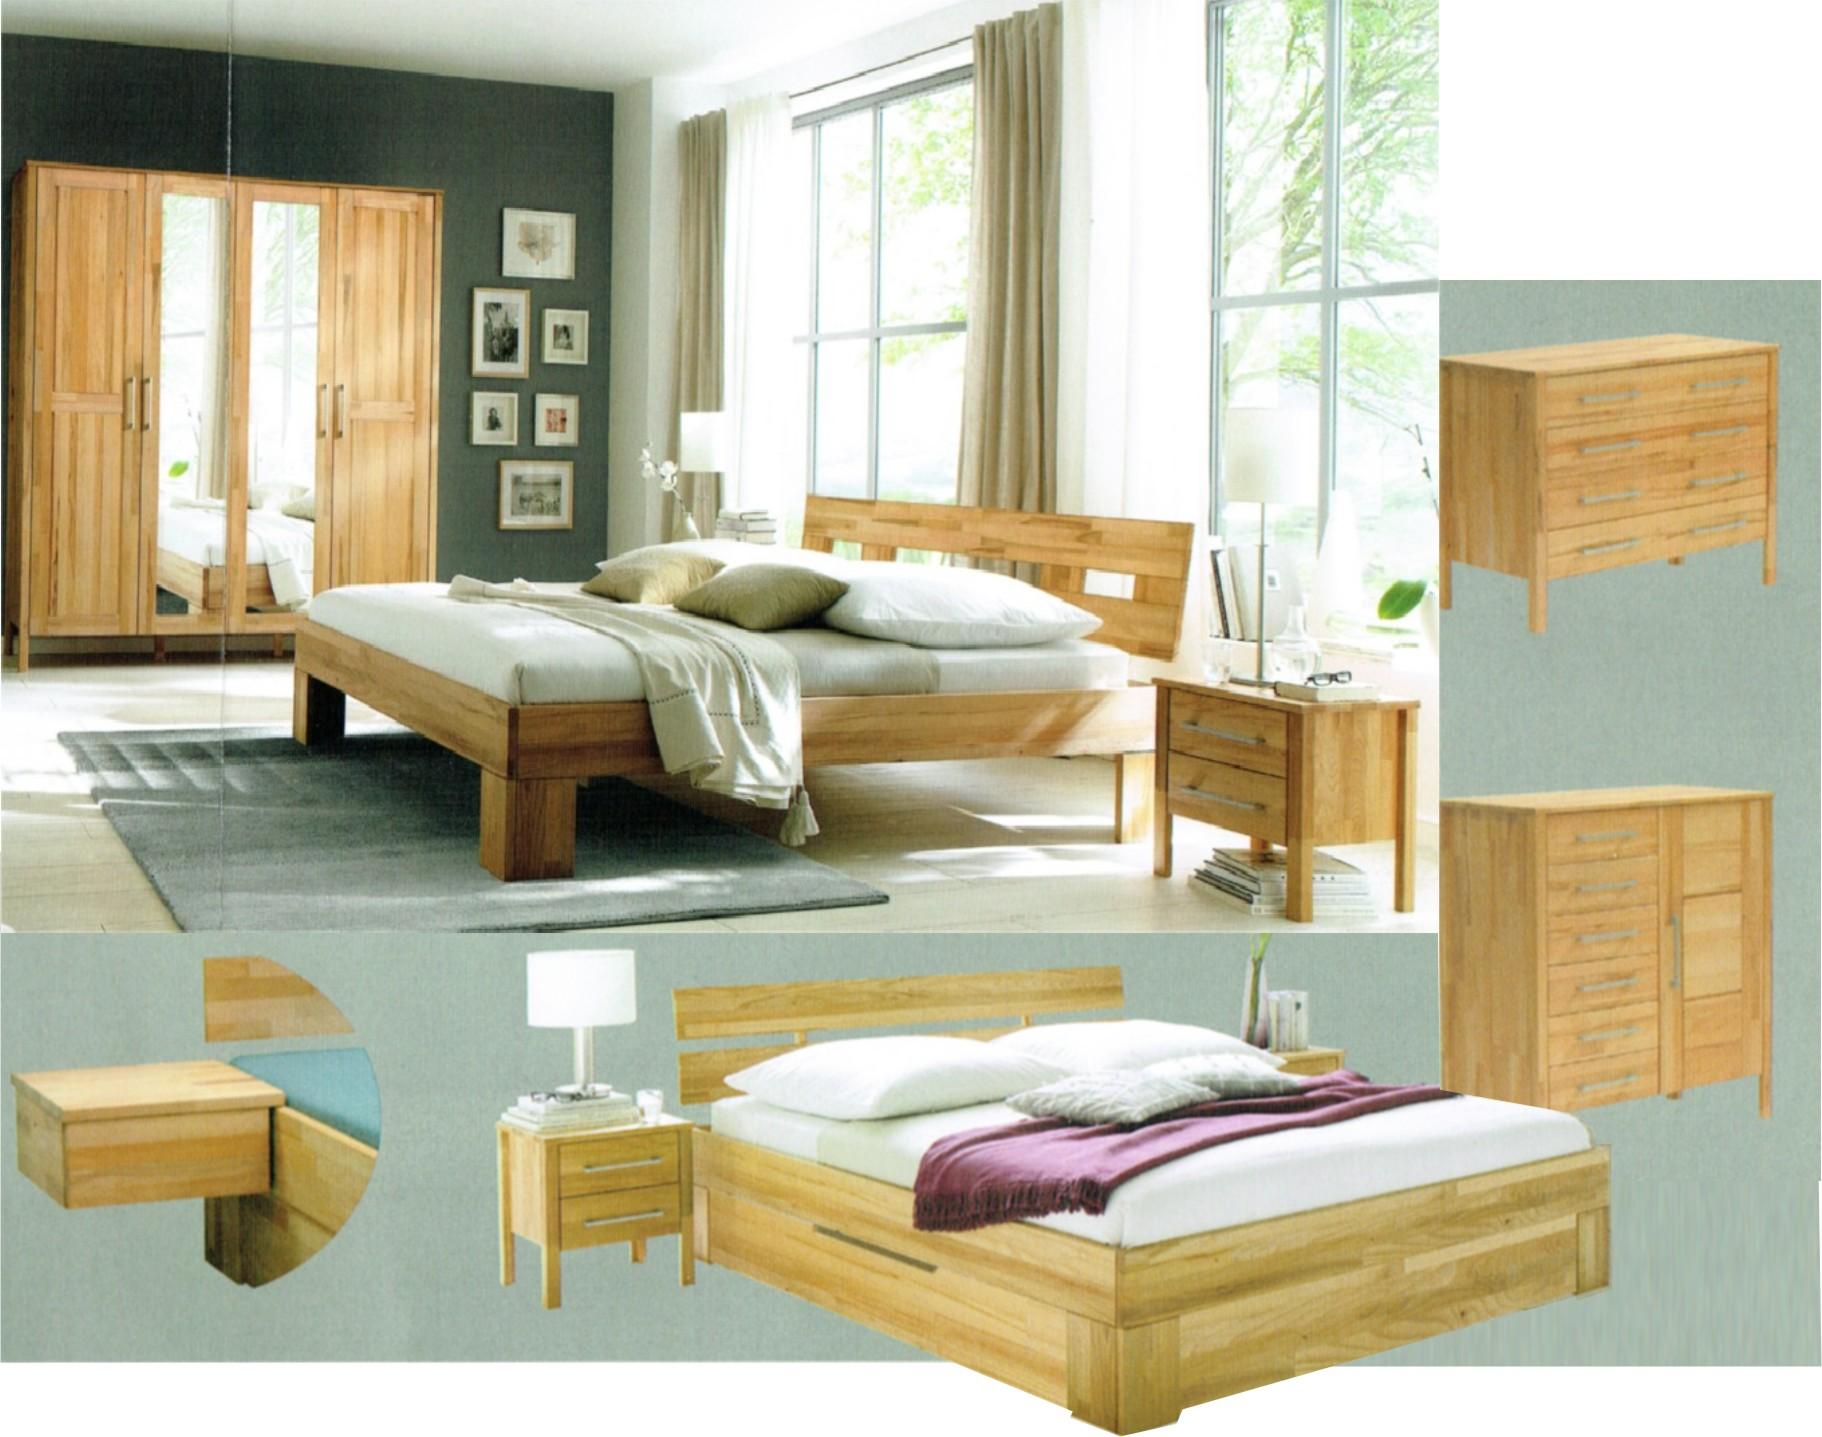 naturbelassene massivholzbetten massivholzschlafzimmer in Schwäbisch ...